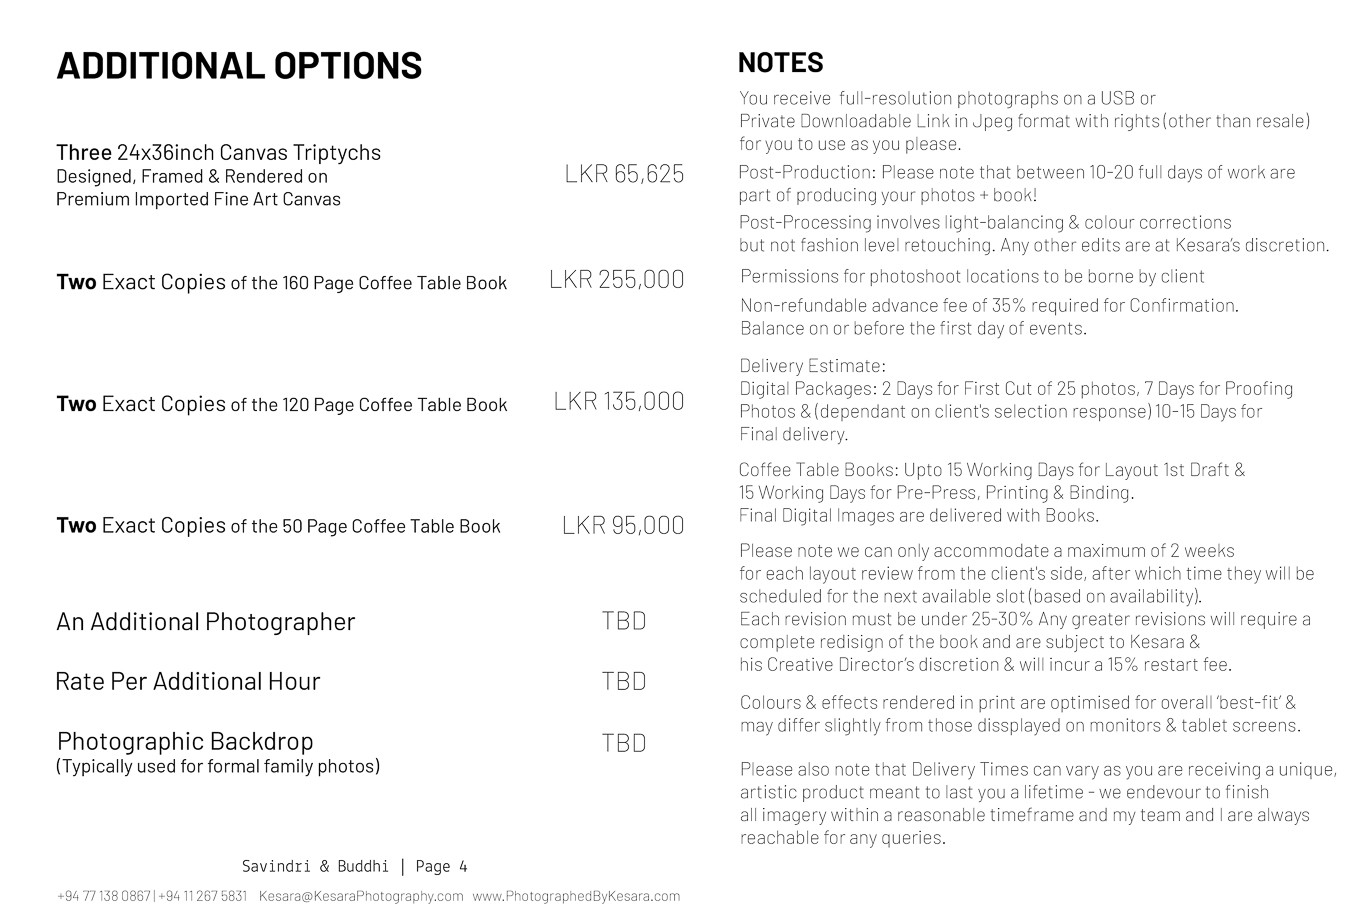 5.1 ADD OPTIONS & NOTES.jpg